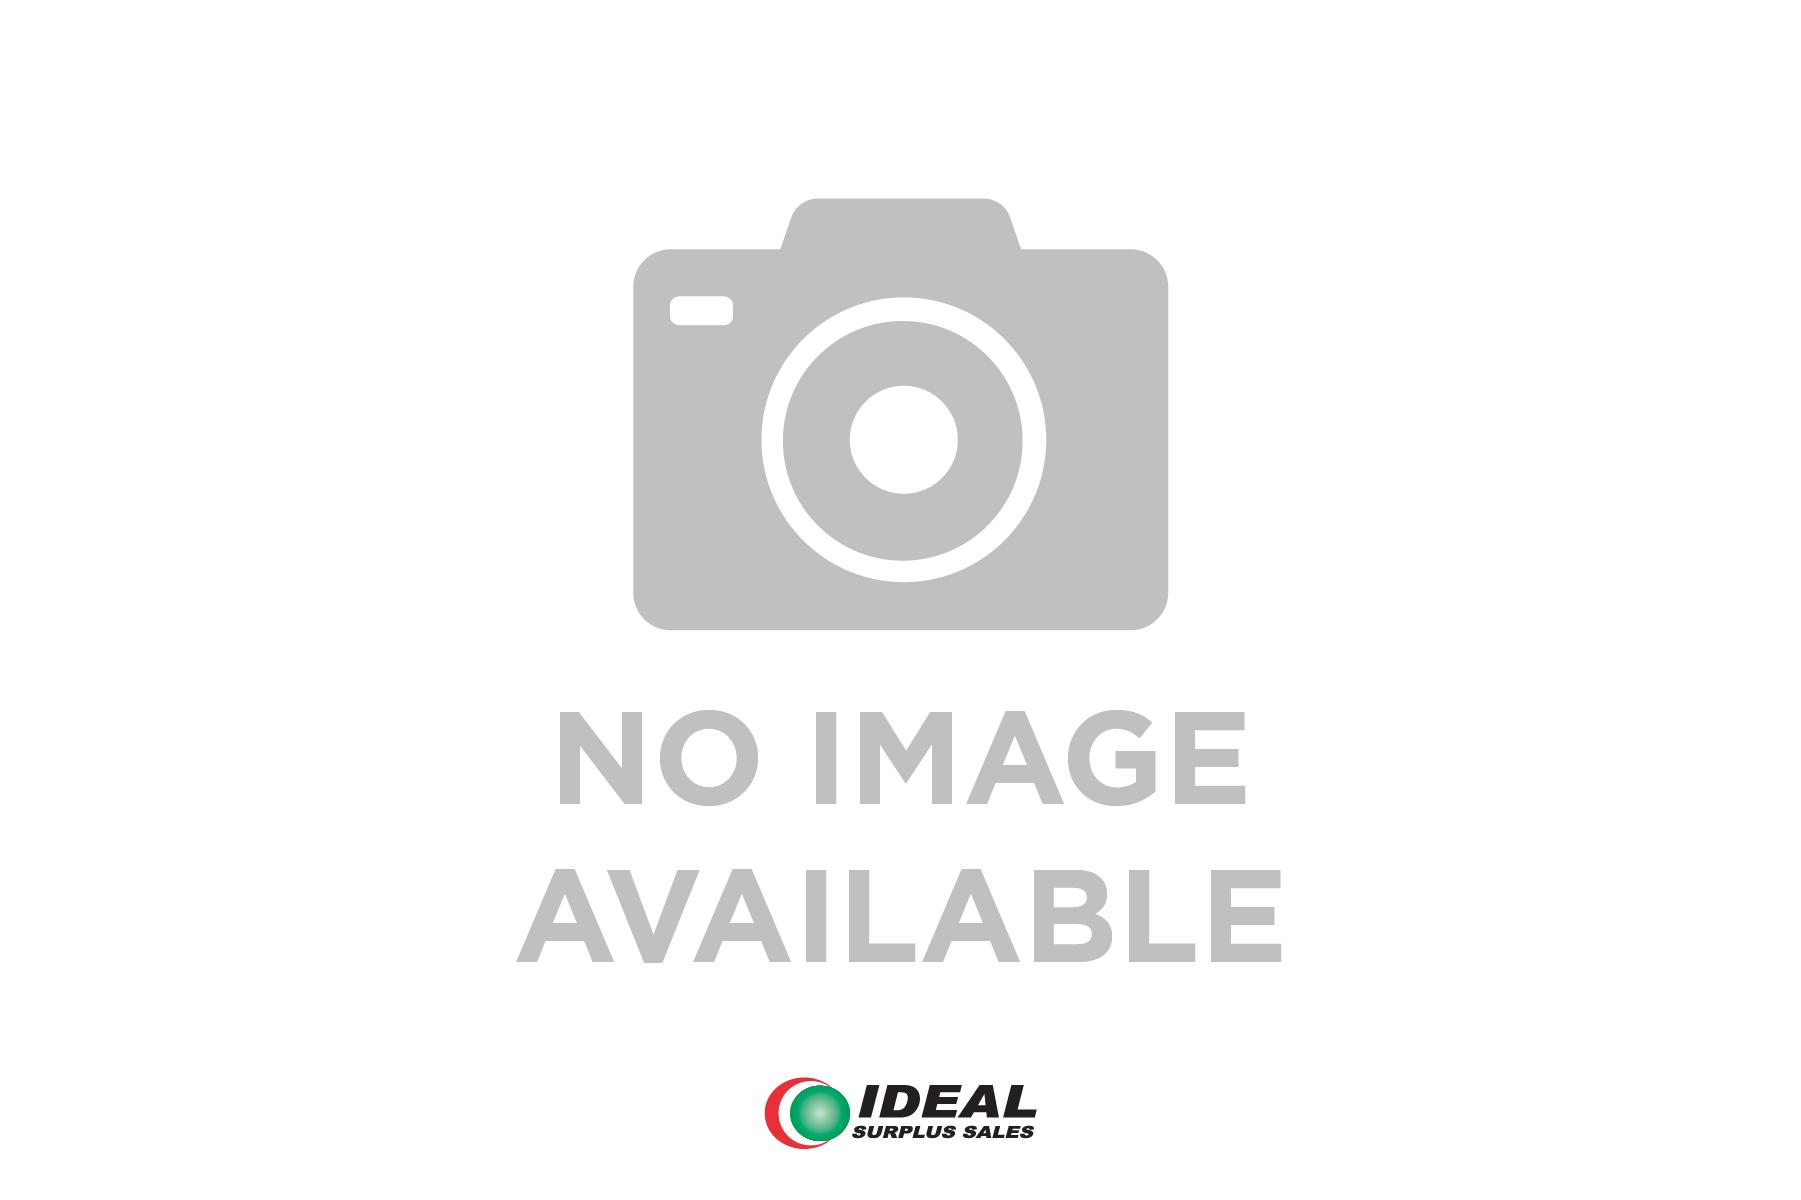 FANUC A660-2005-T168/L14R53B CABLE New